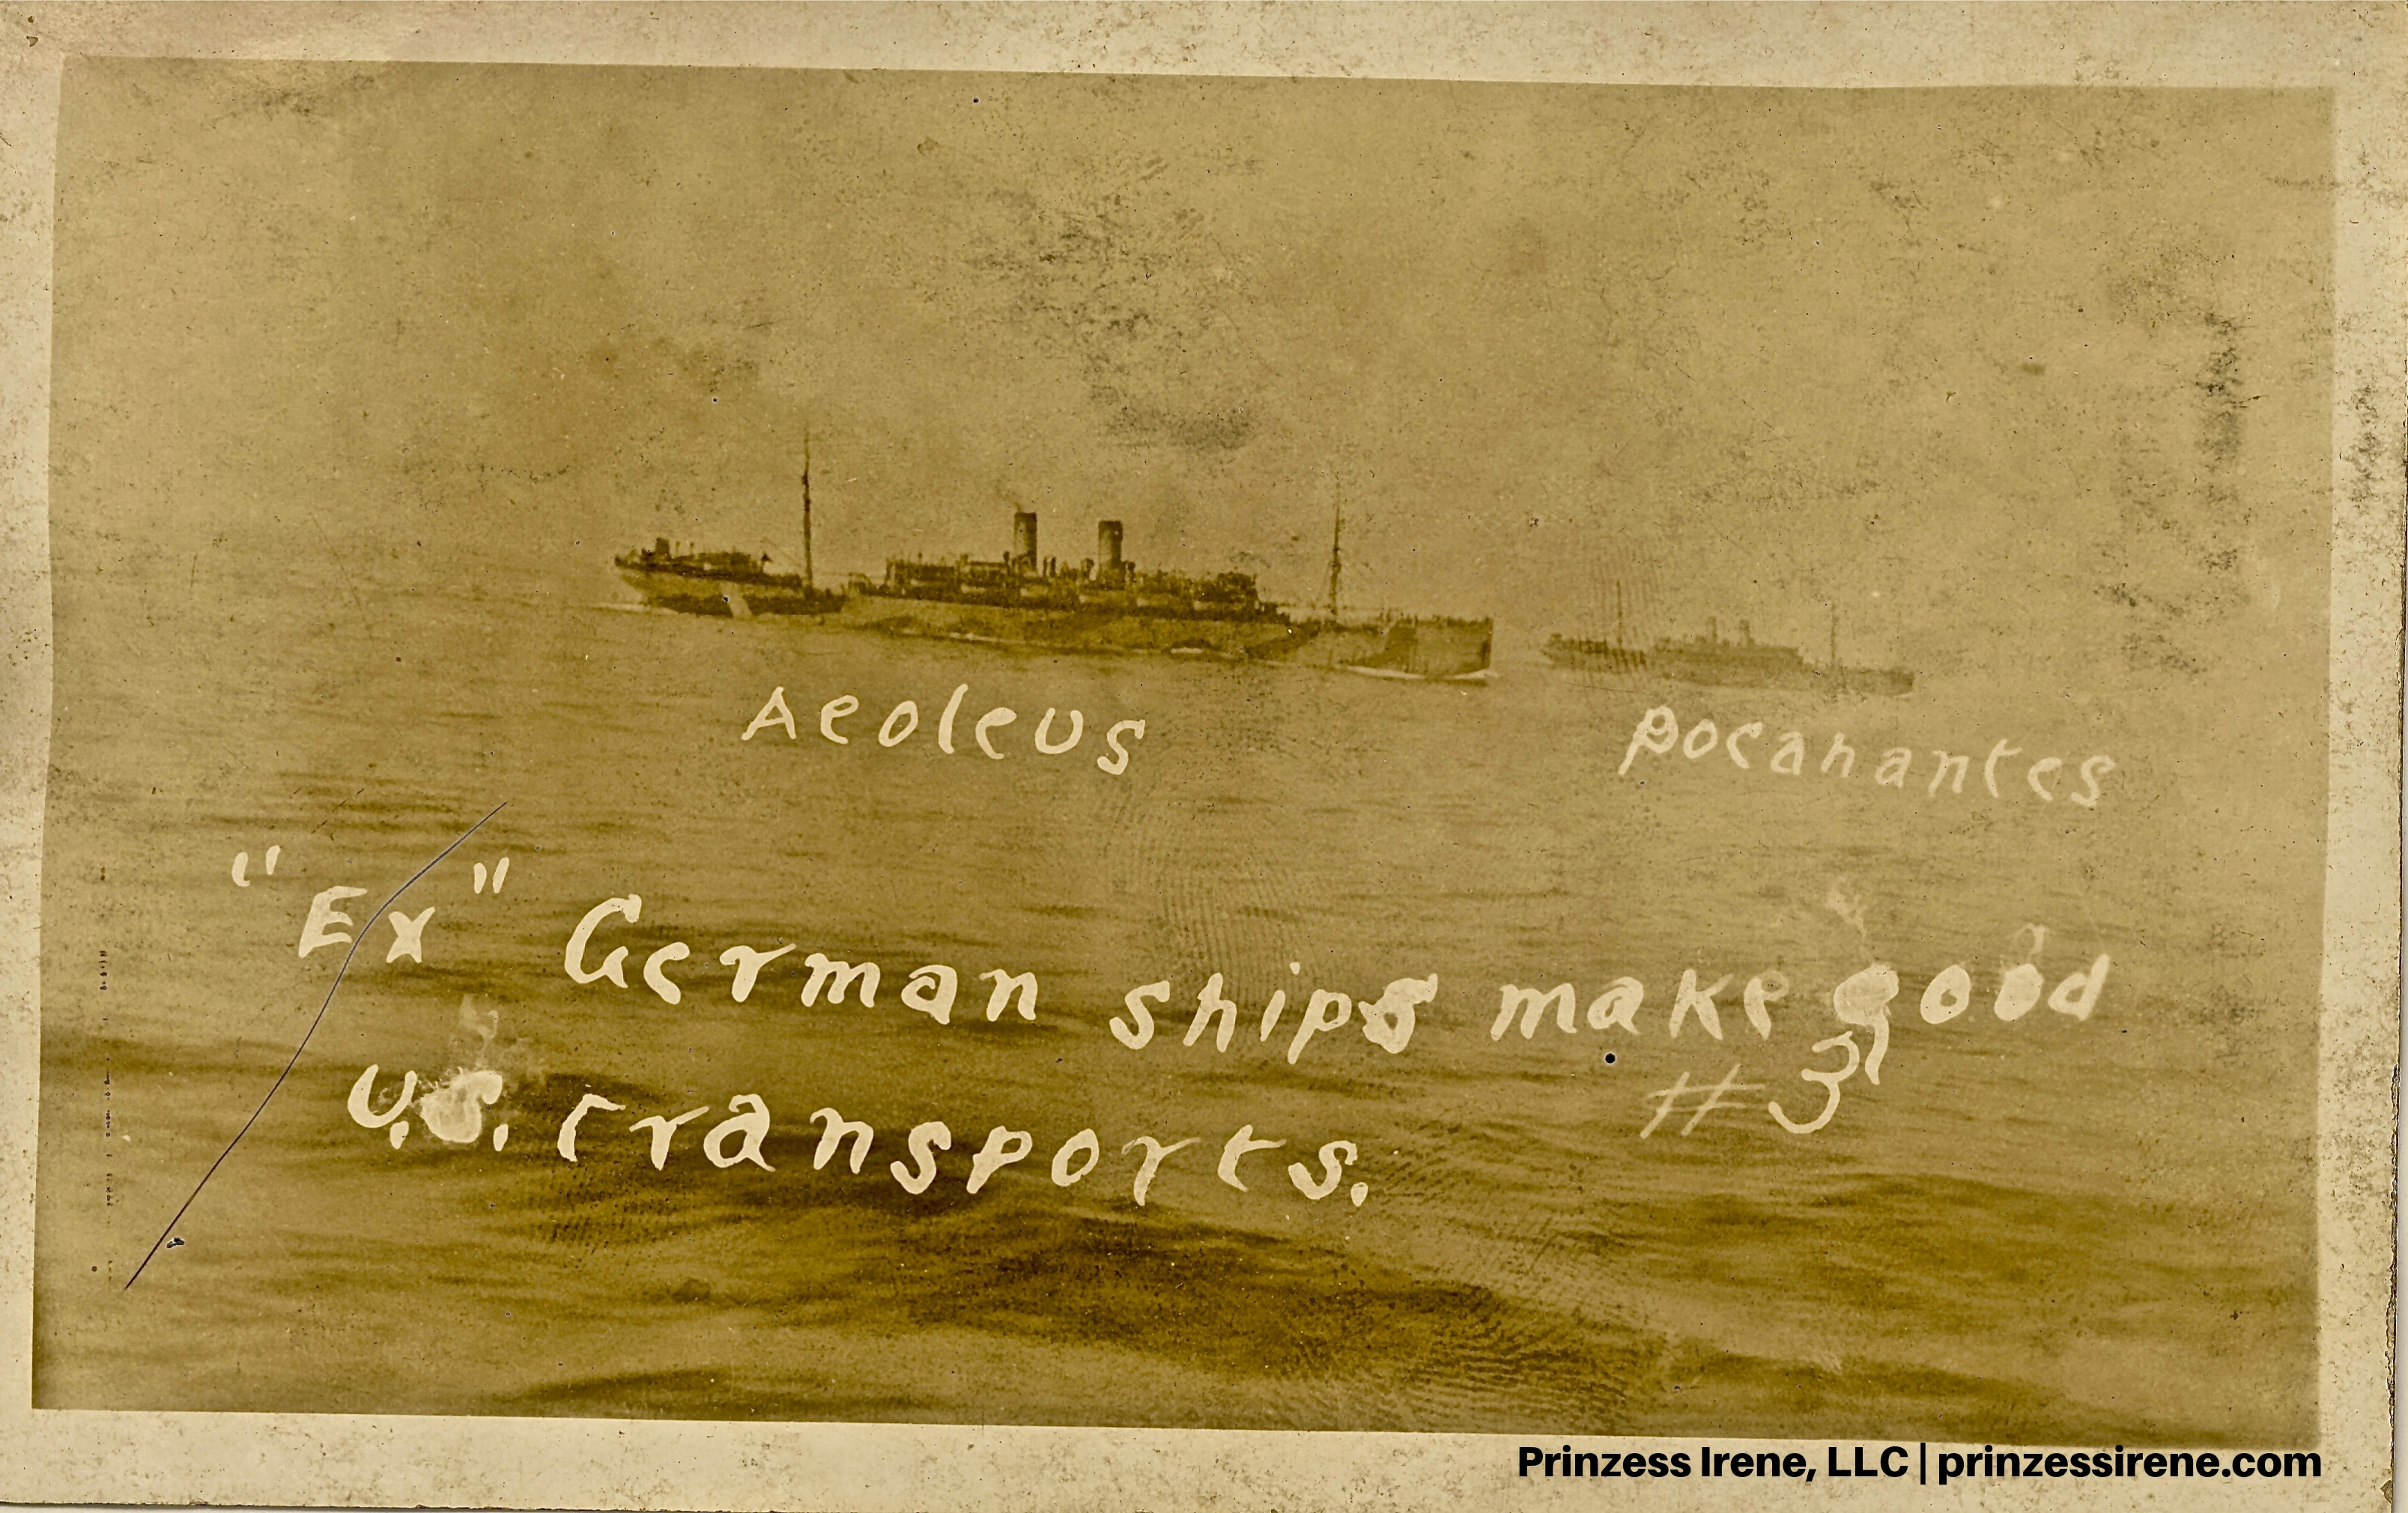 Pocahontas and Aeoleus. Real photo postcard, 1919.